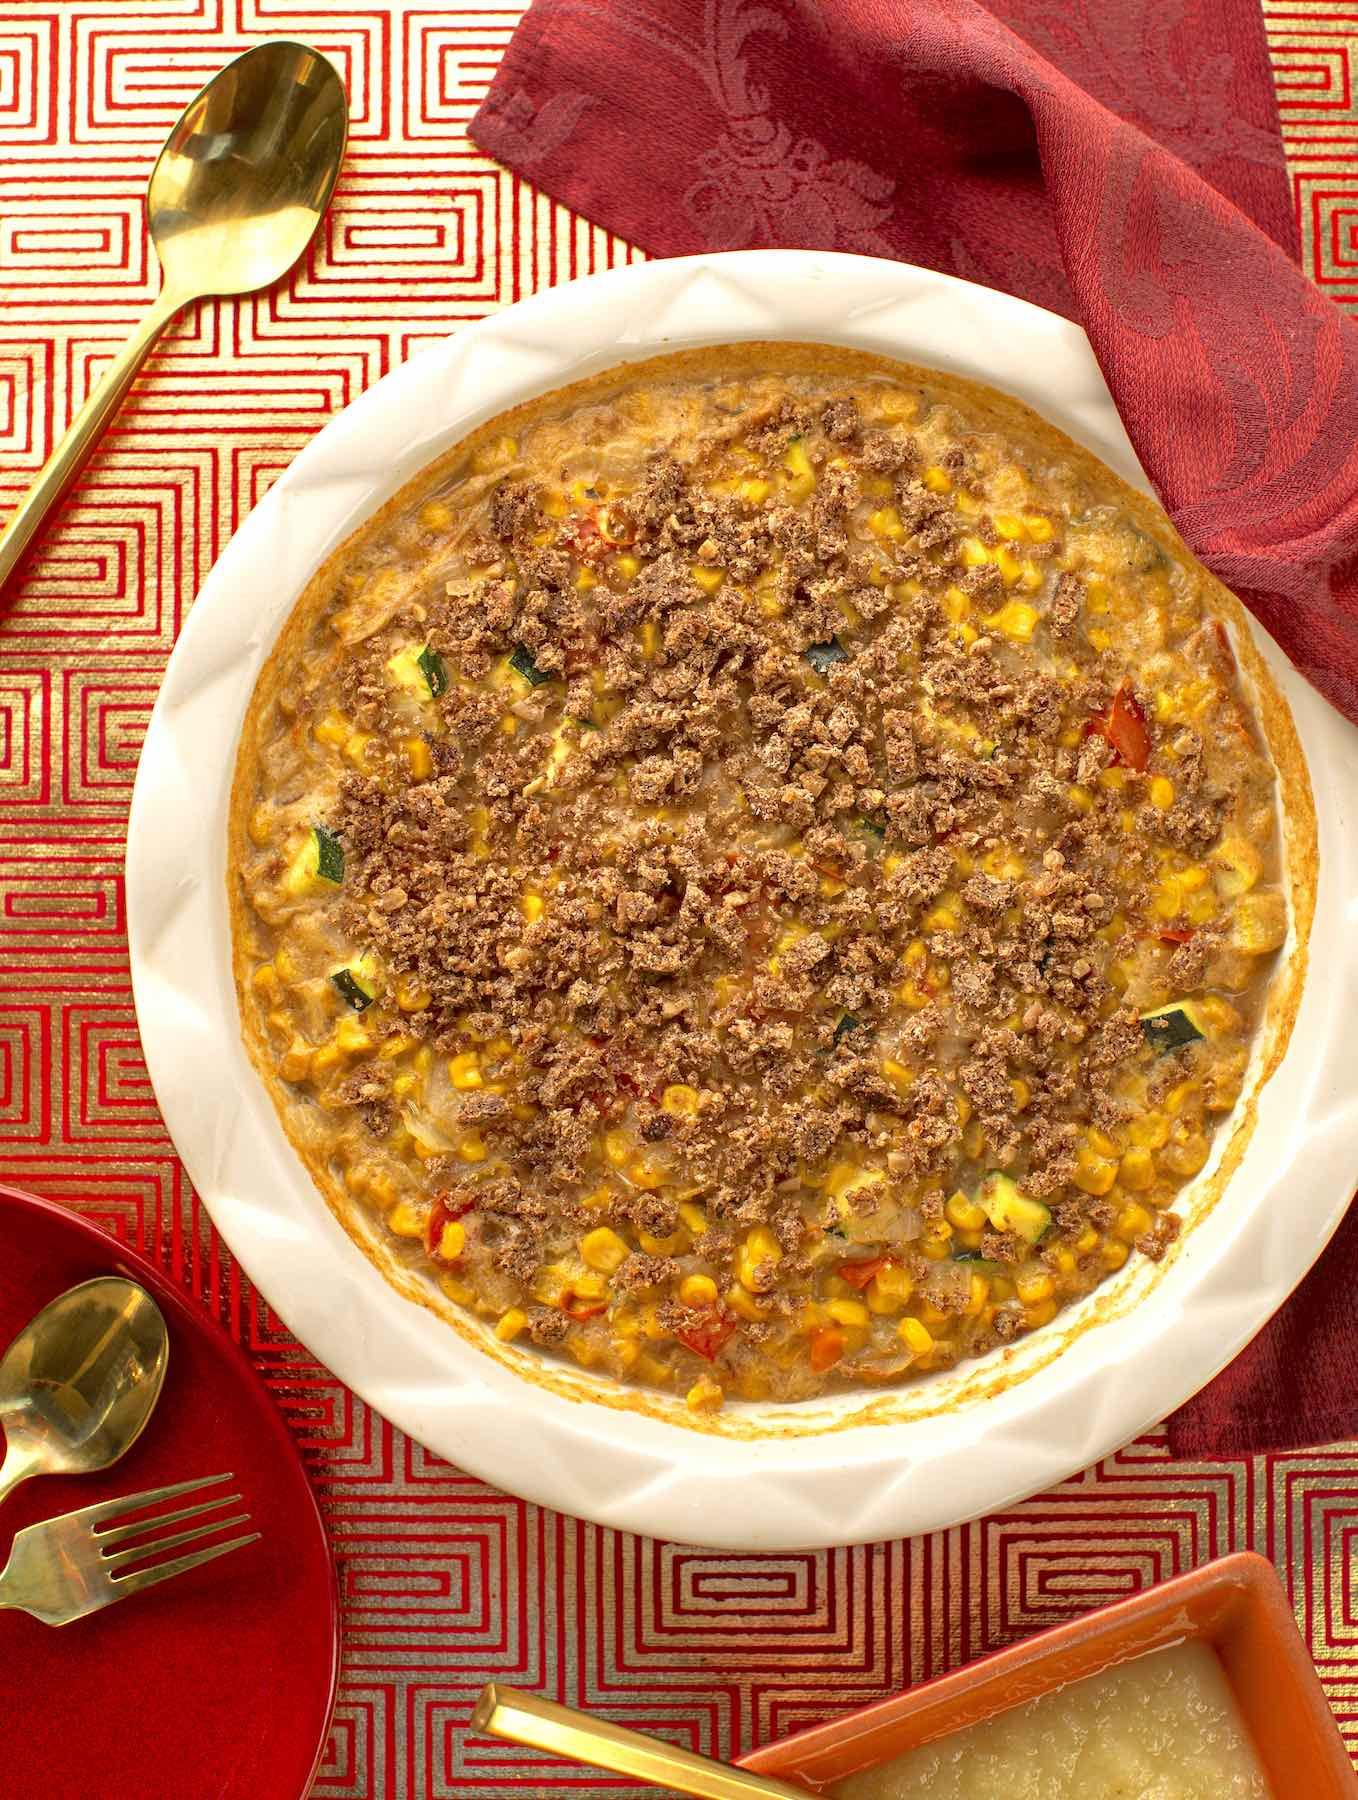 vegan Scalloped corn in casserole dish